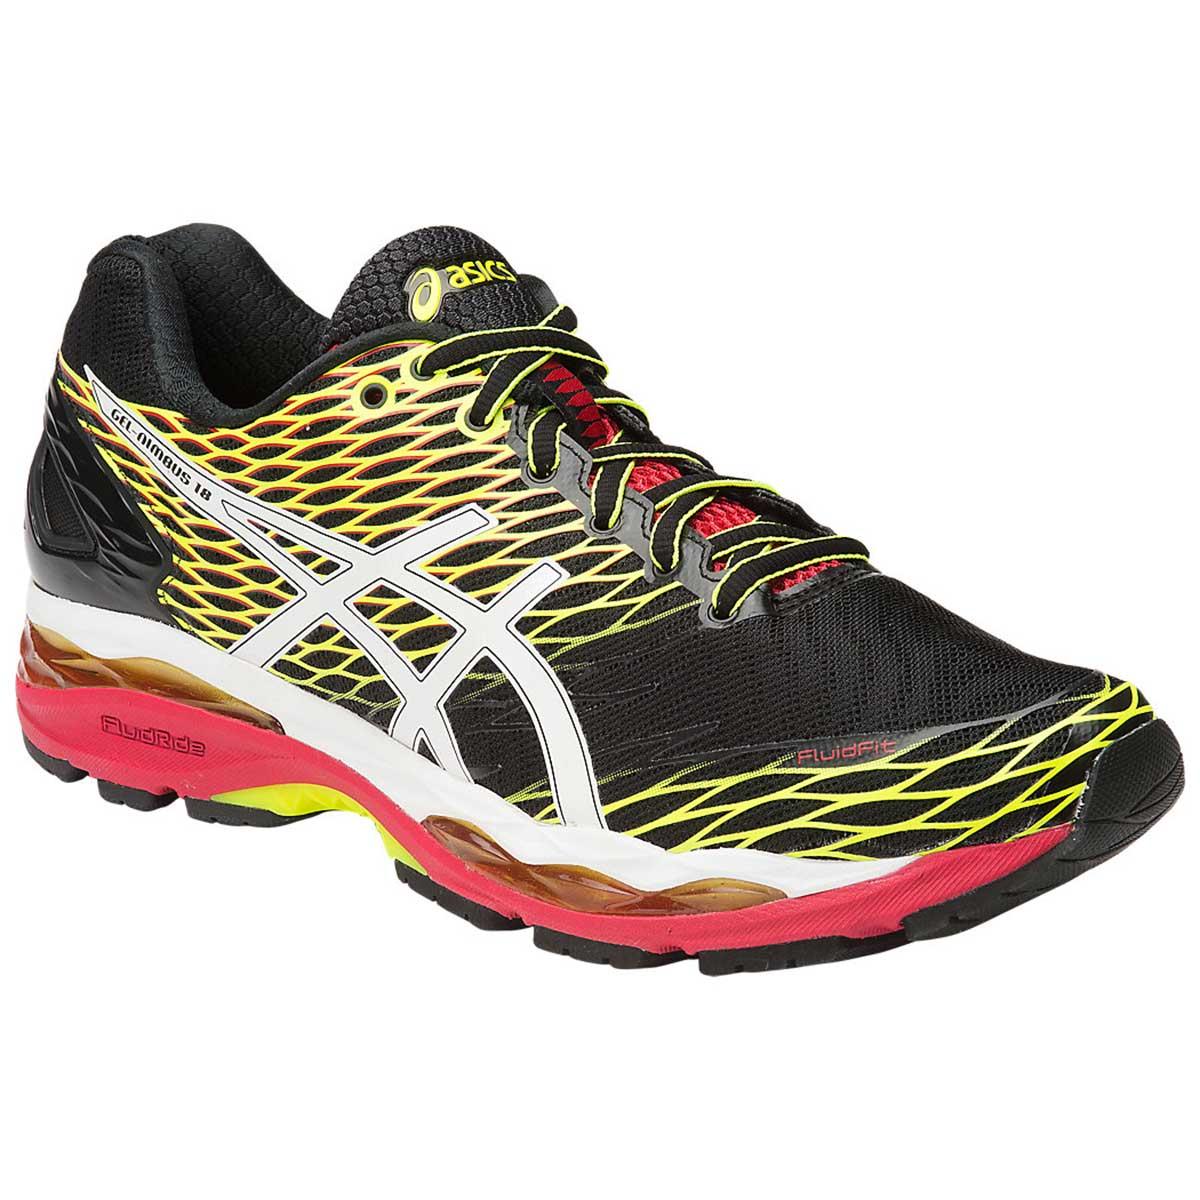 Snow Running Shoes >> Buy Asics Gel Nimbus 18 Running Shoes Black Snow Fiery Red Online